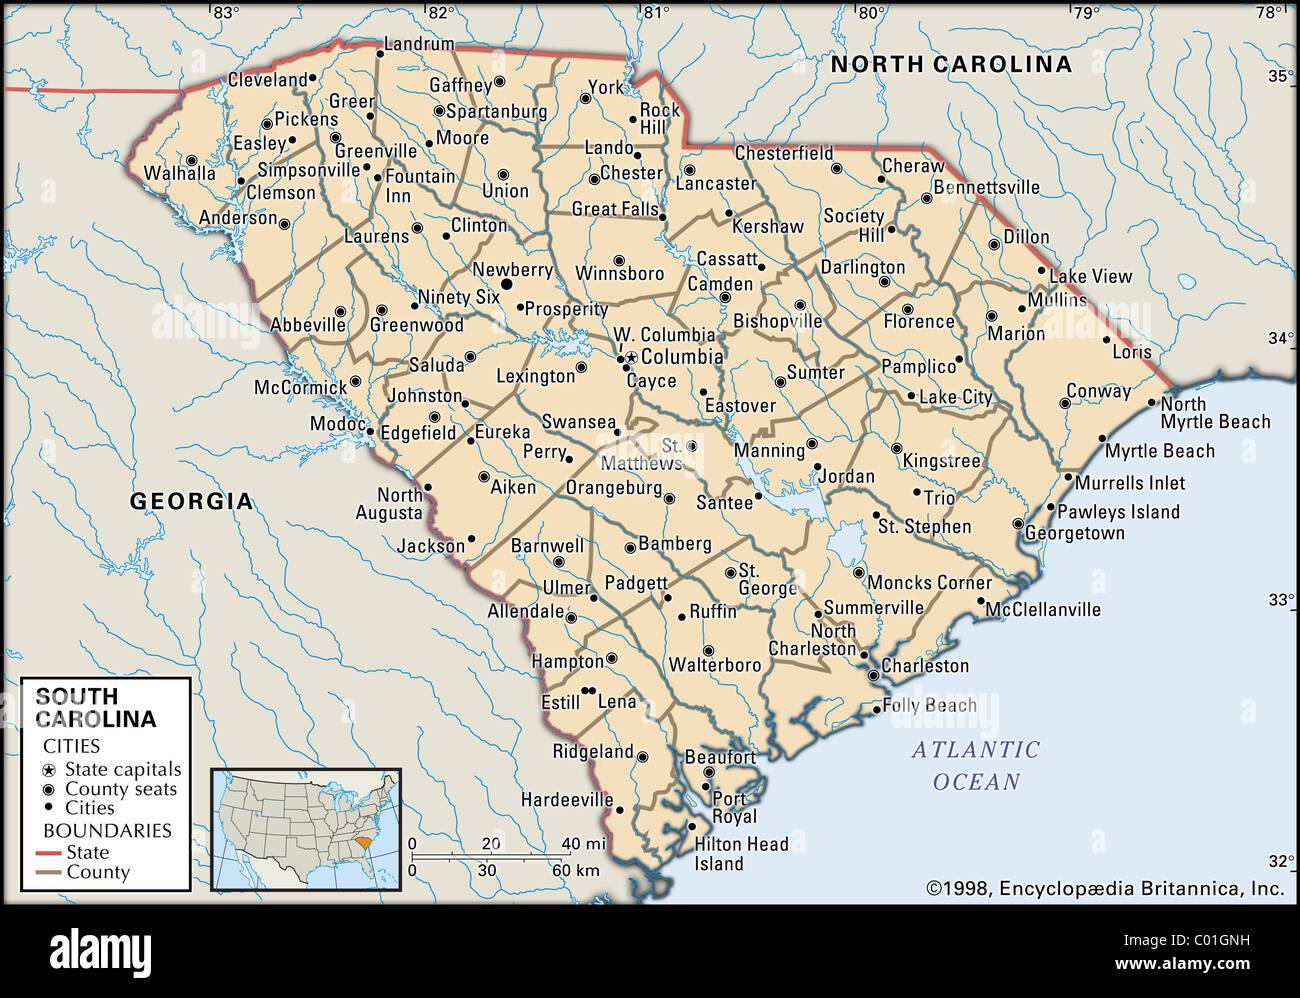 Map of South Carolina Stock Photo Royalty Free Image 34455837